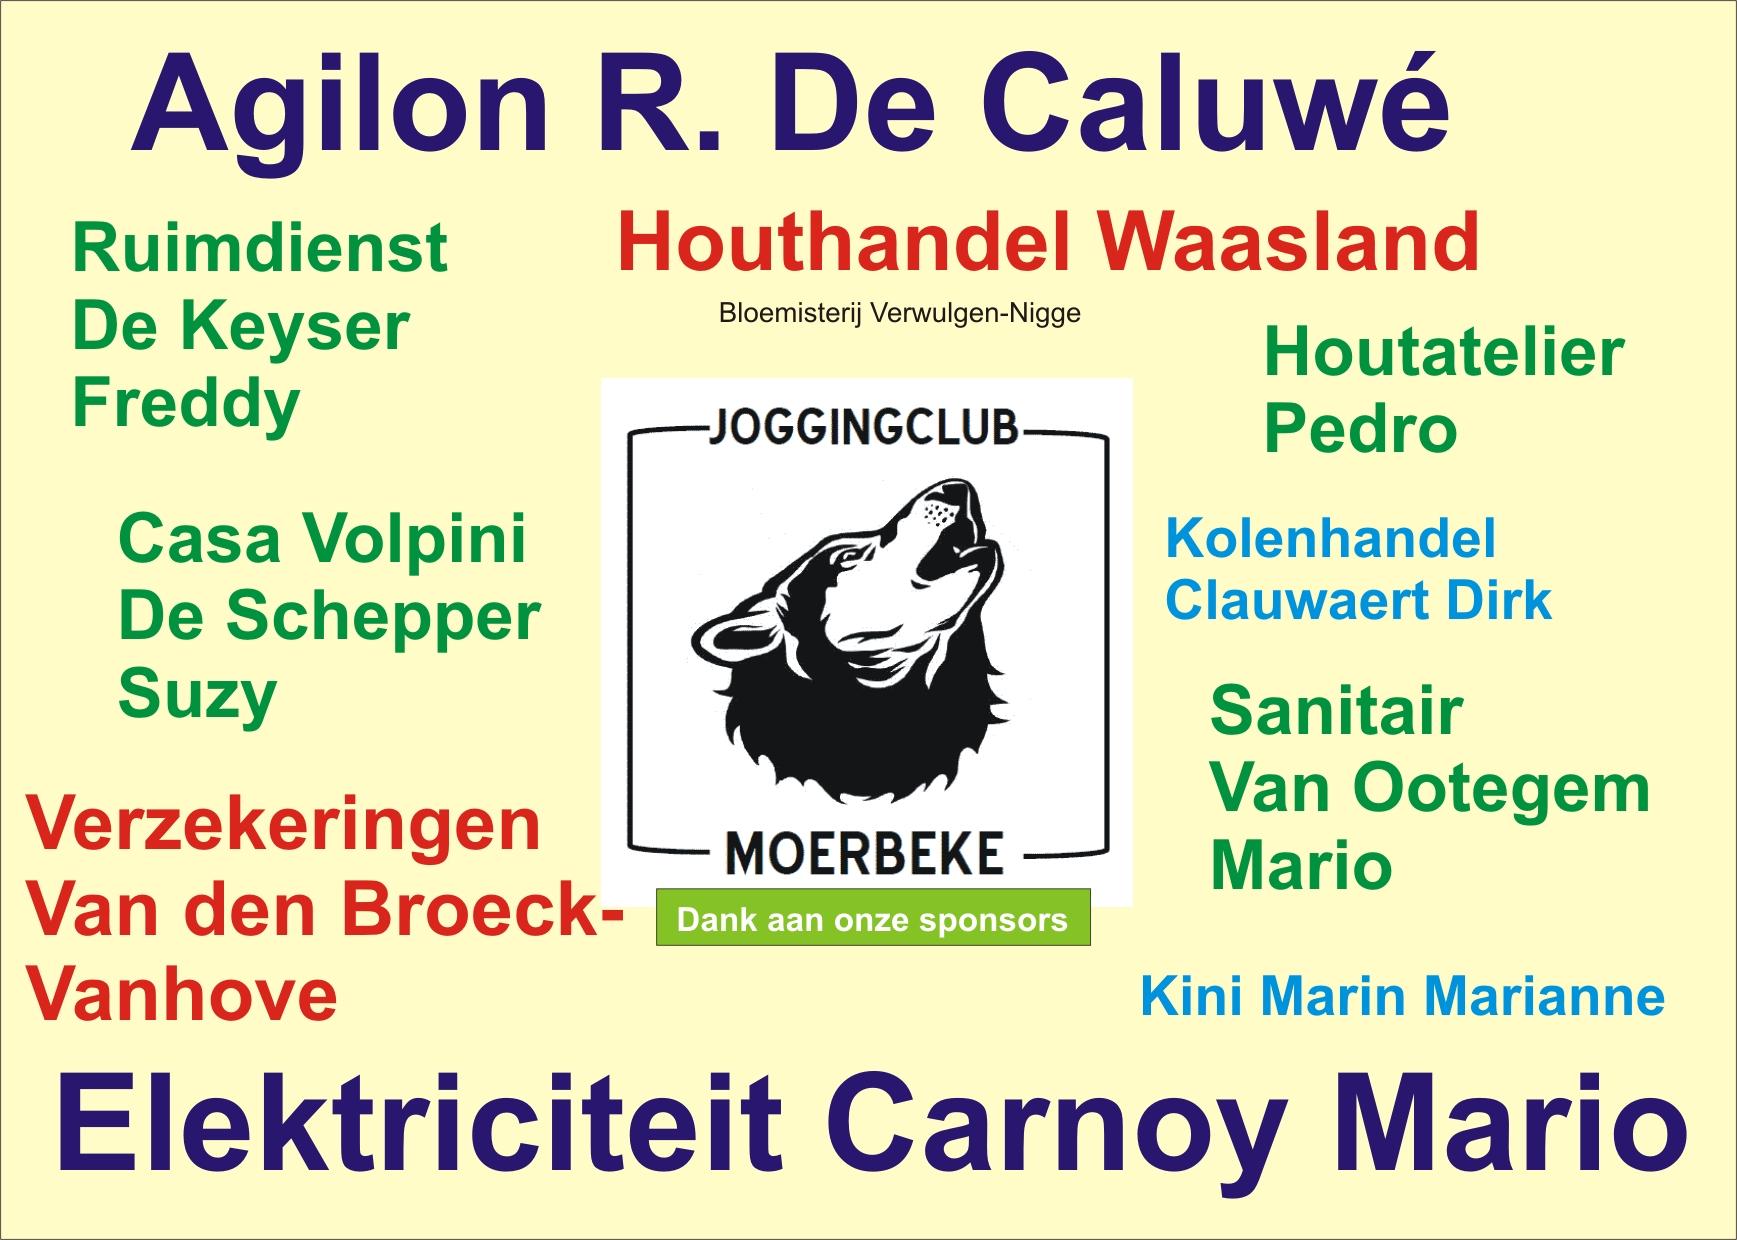 http://www.joggingclubmoerbeke.be/2014/mhl/mhlspons03.jpg